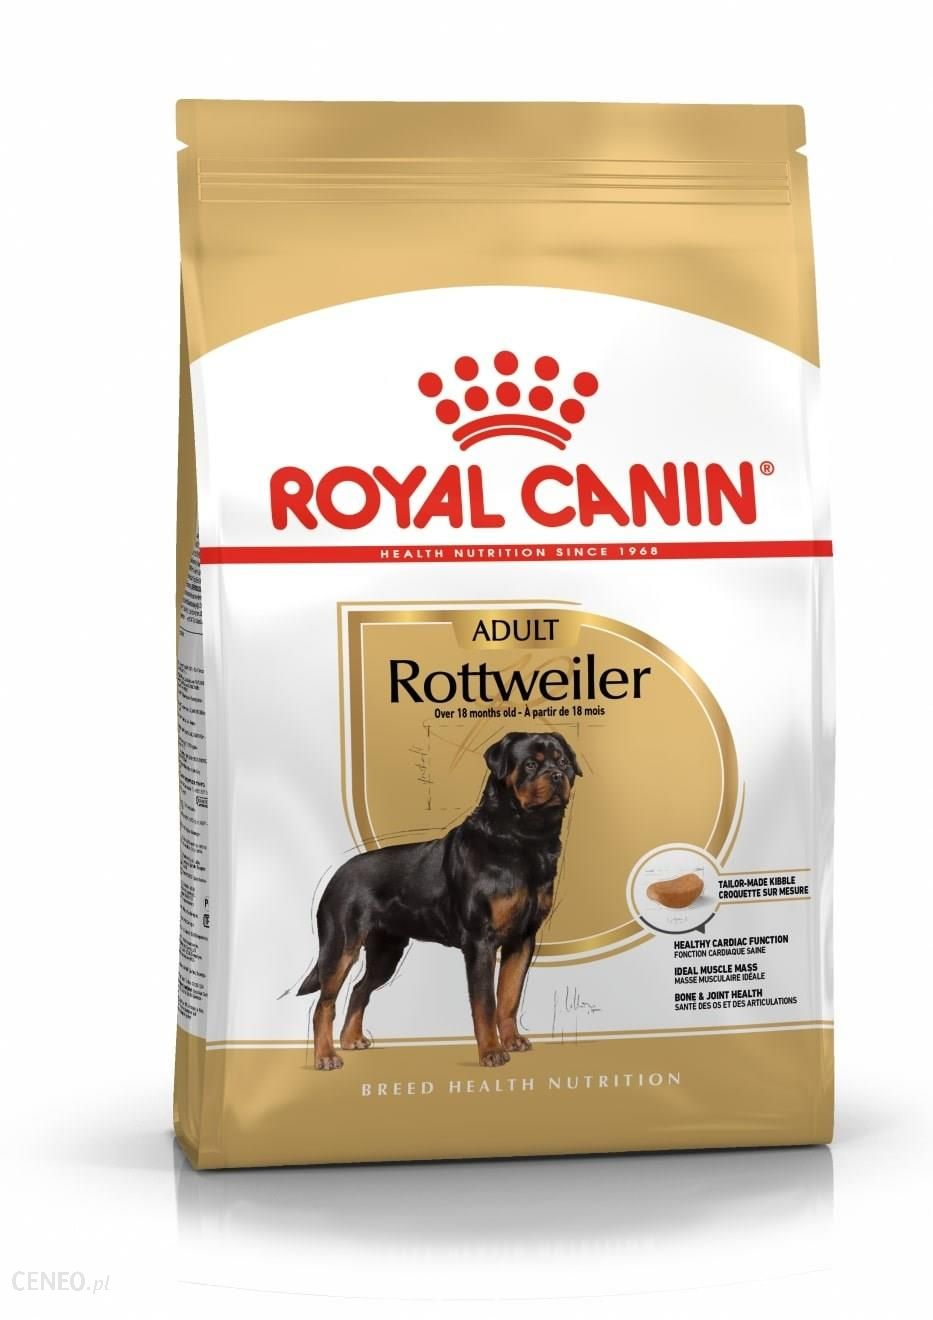 Royal Canin Rottweiler Adult 2x12kg